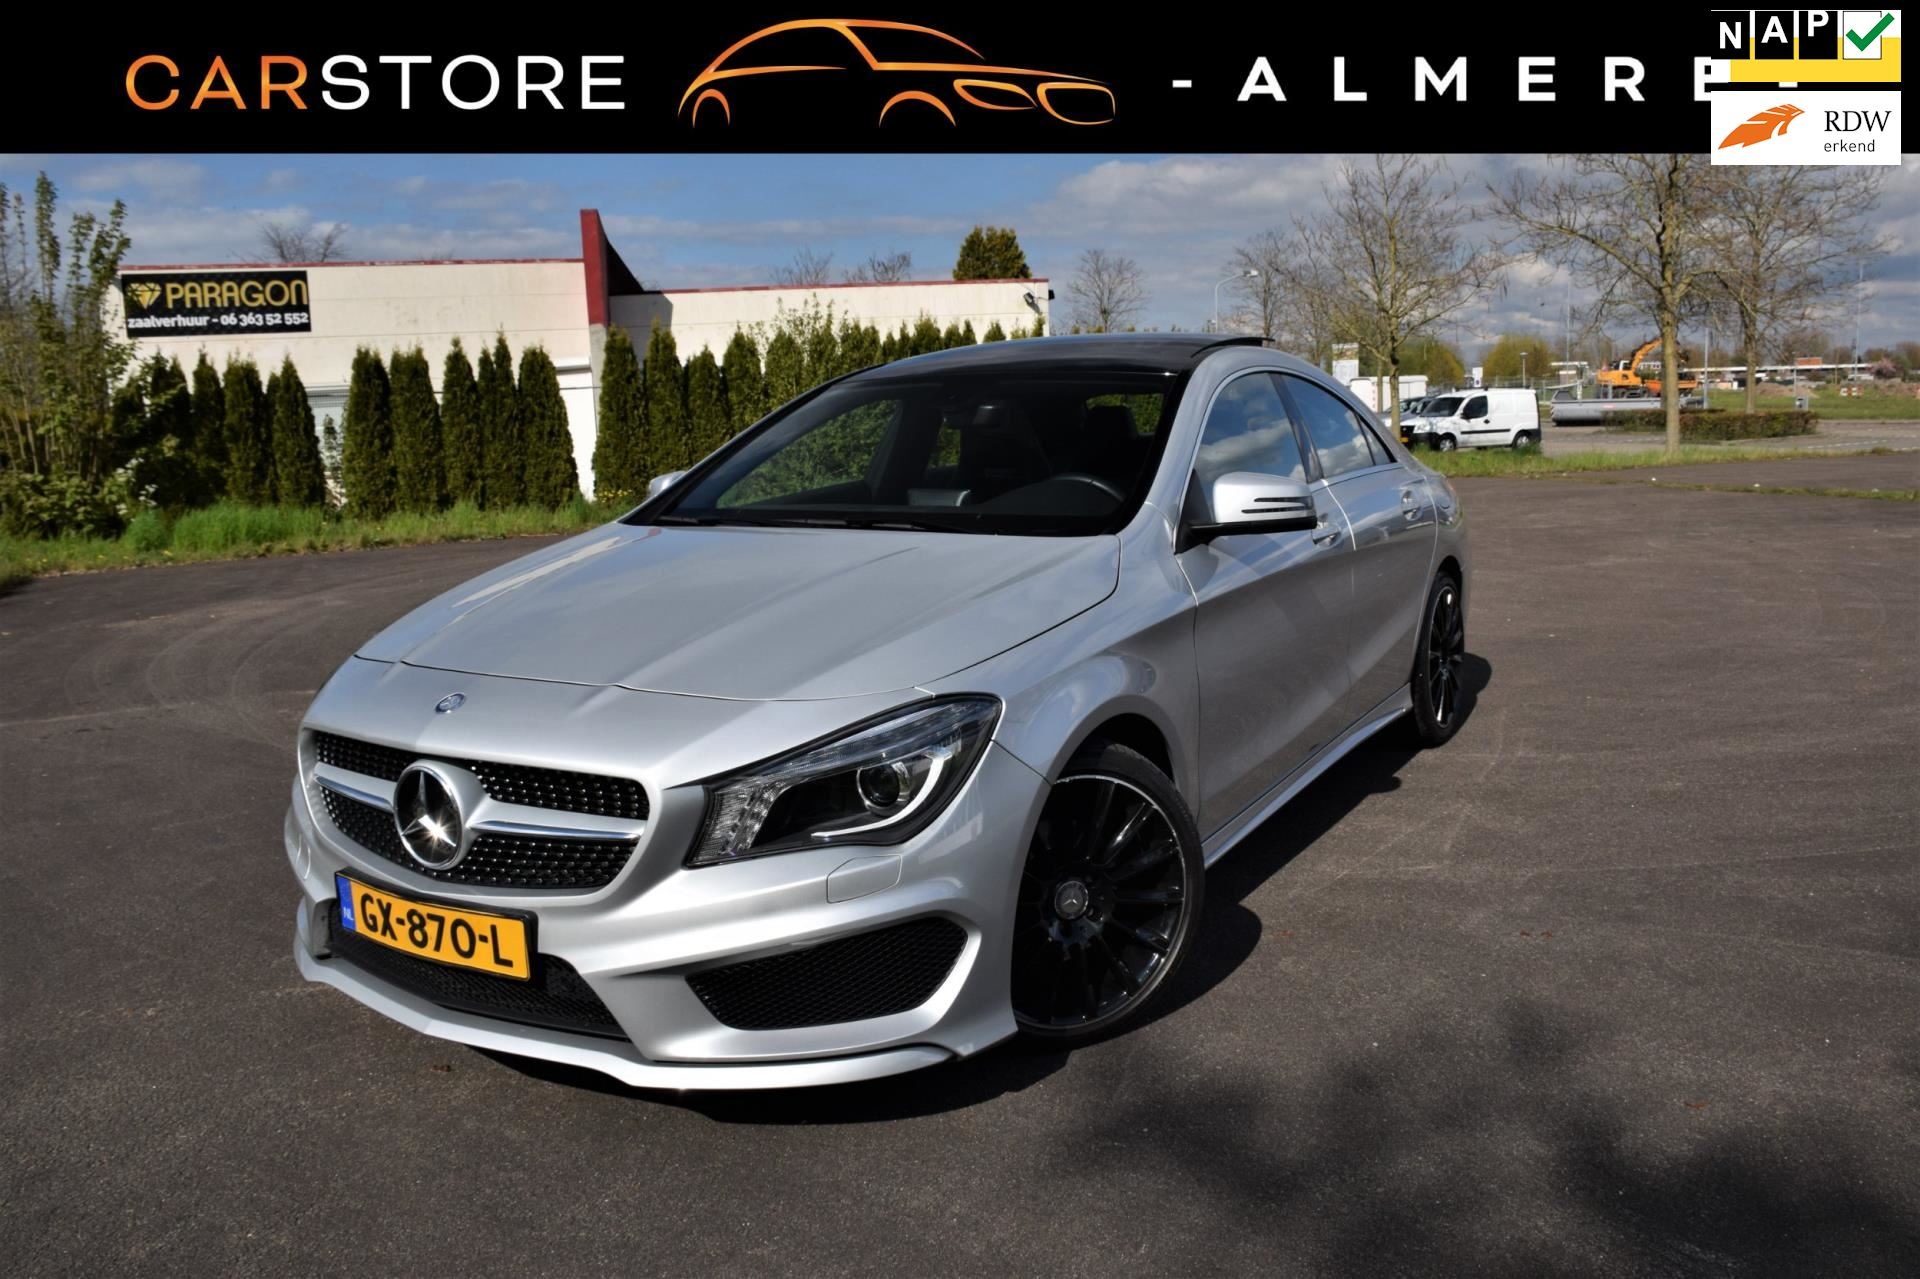 Mercedes-Benz CLA-klasse occasion - Used Car Store Almere